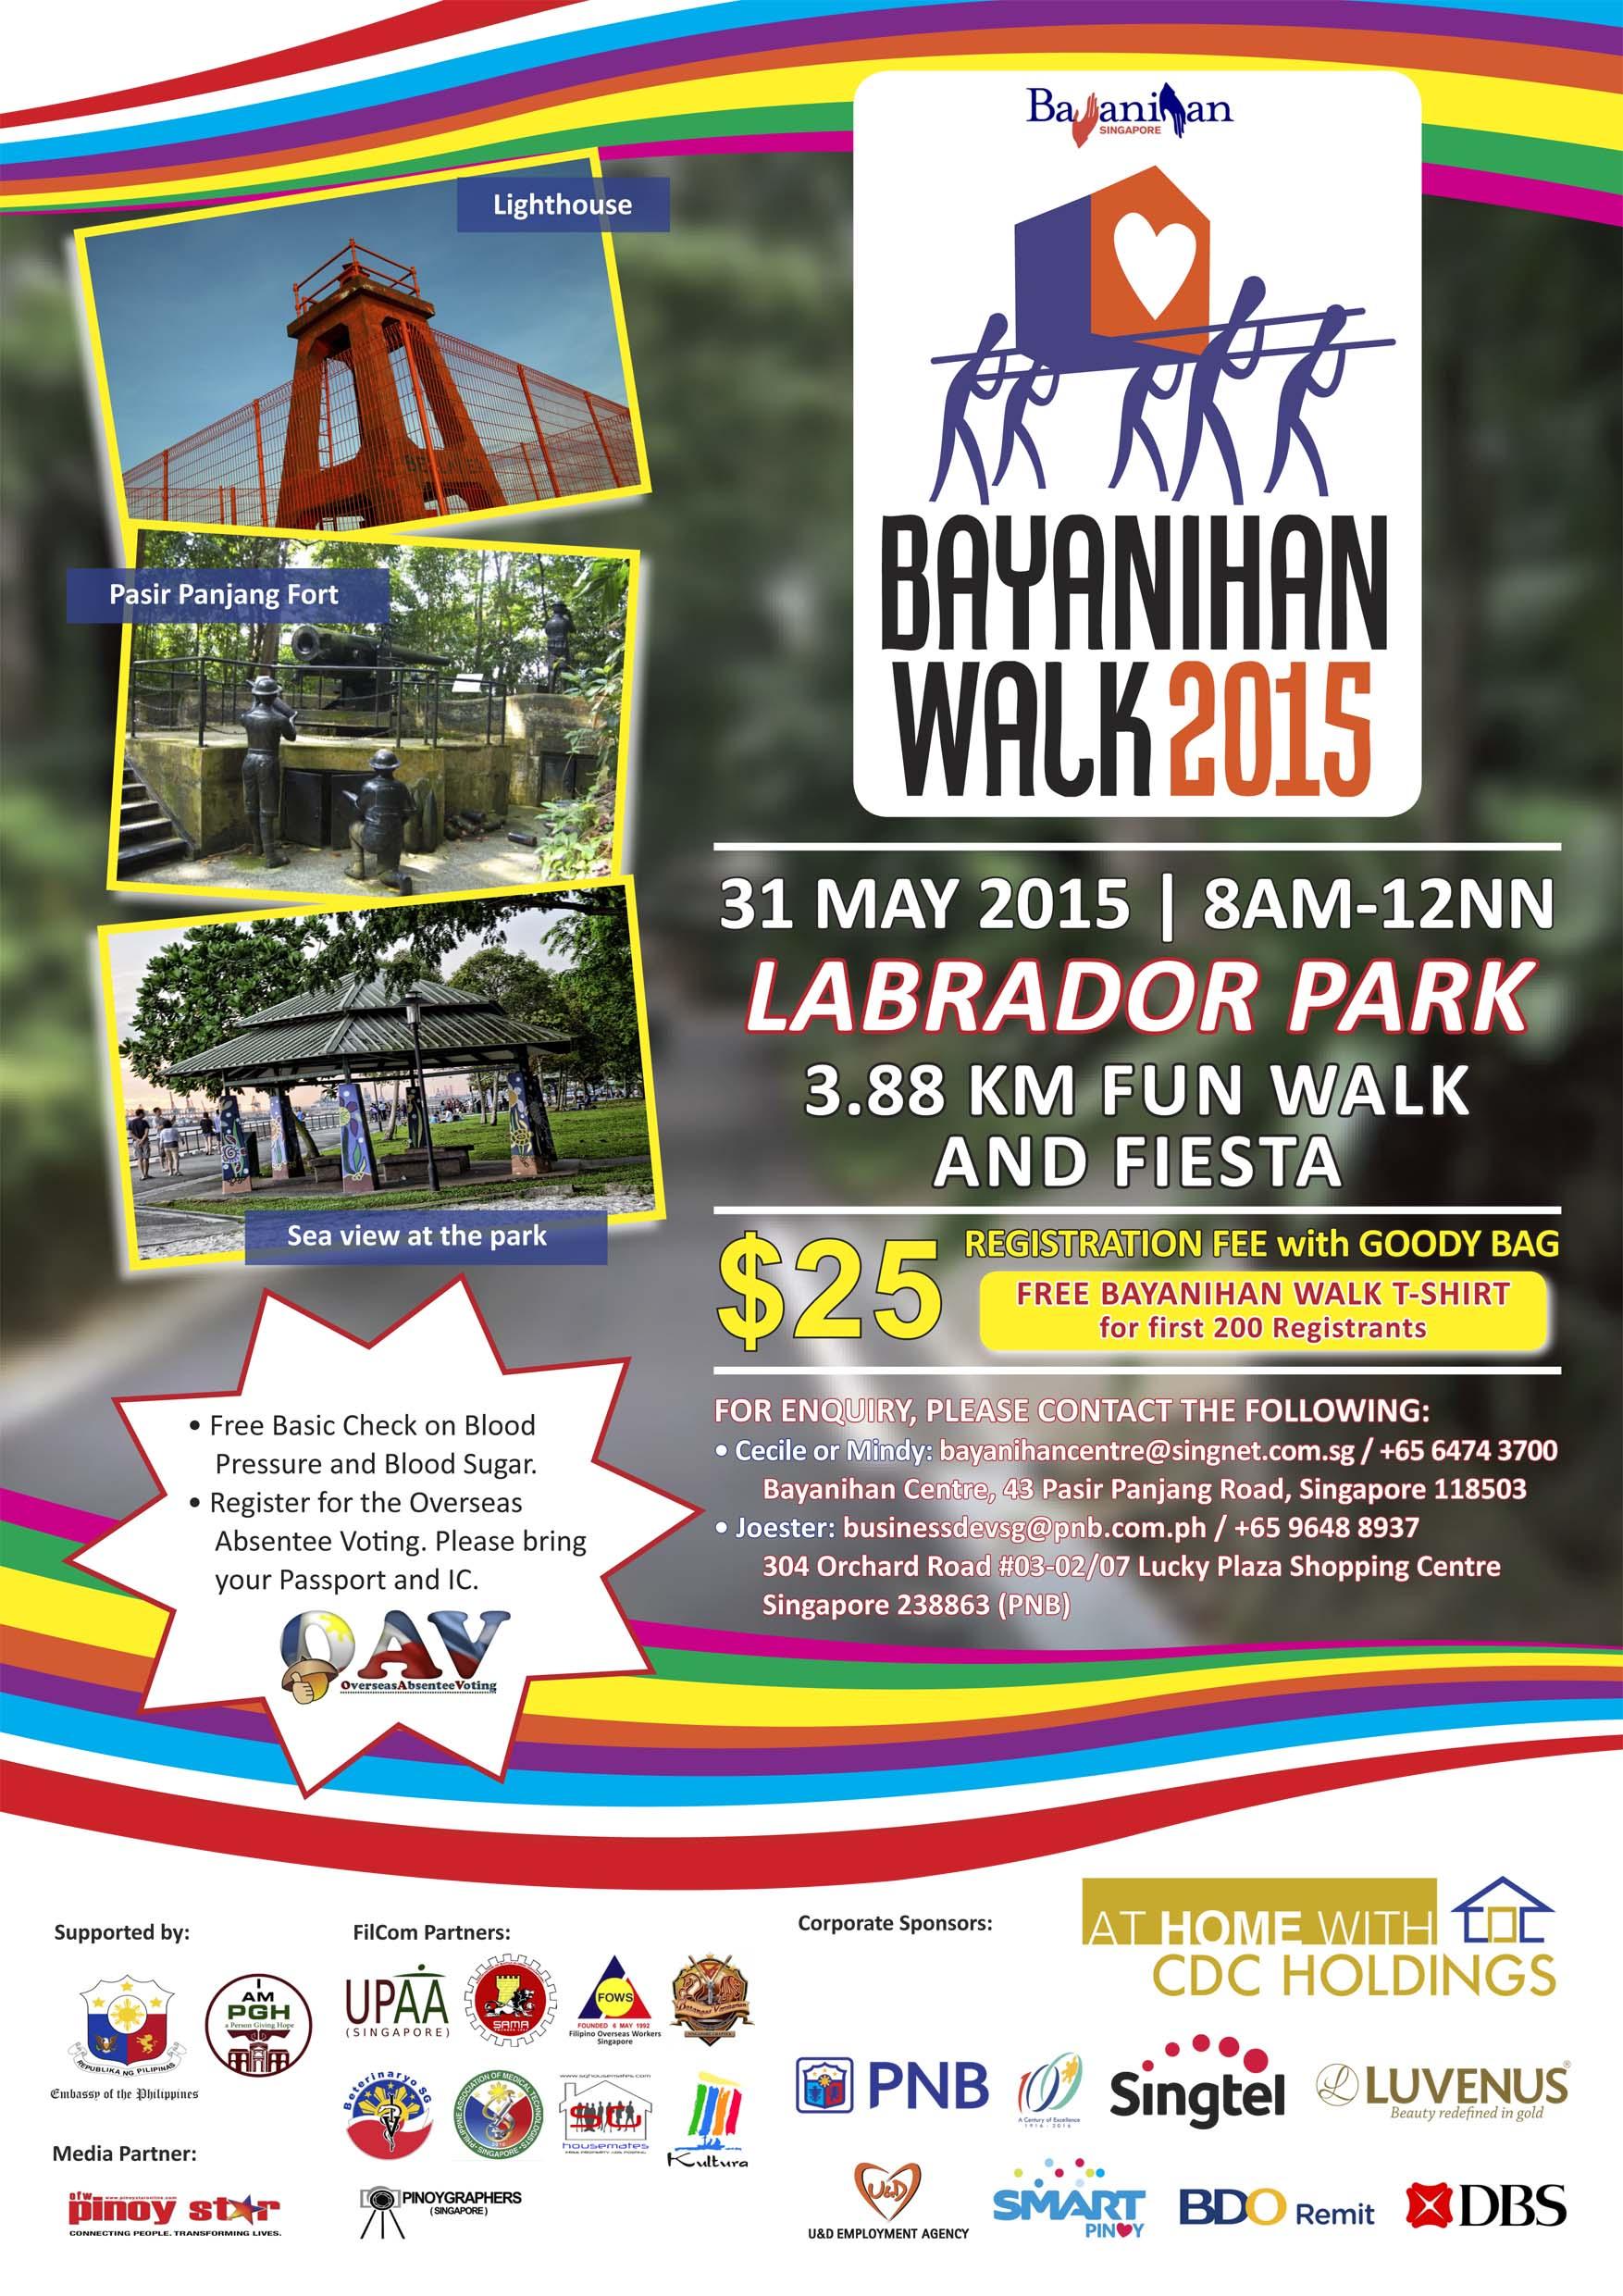 Bayanihan Walk 2015 EDM (20 Apr 2015)